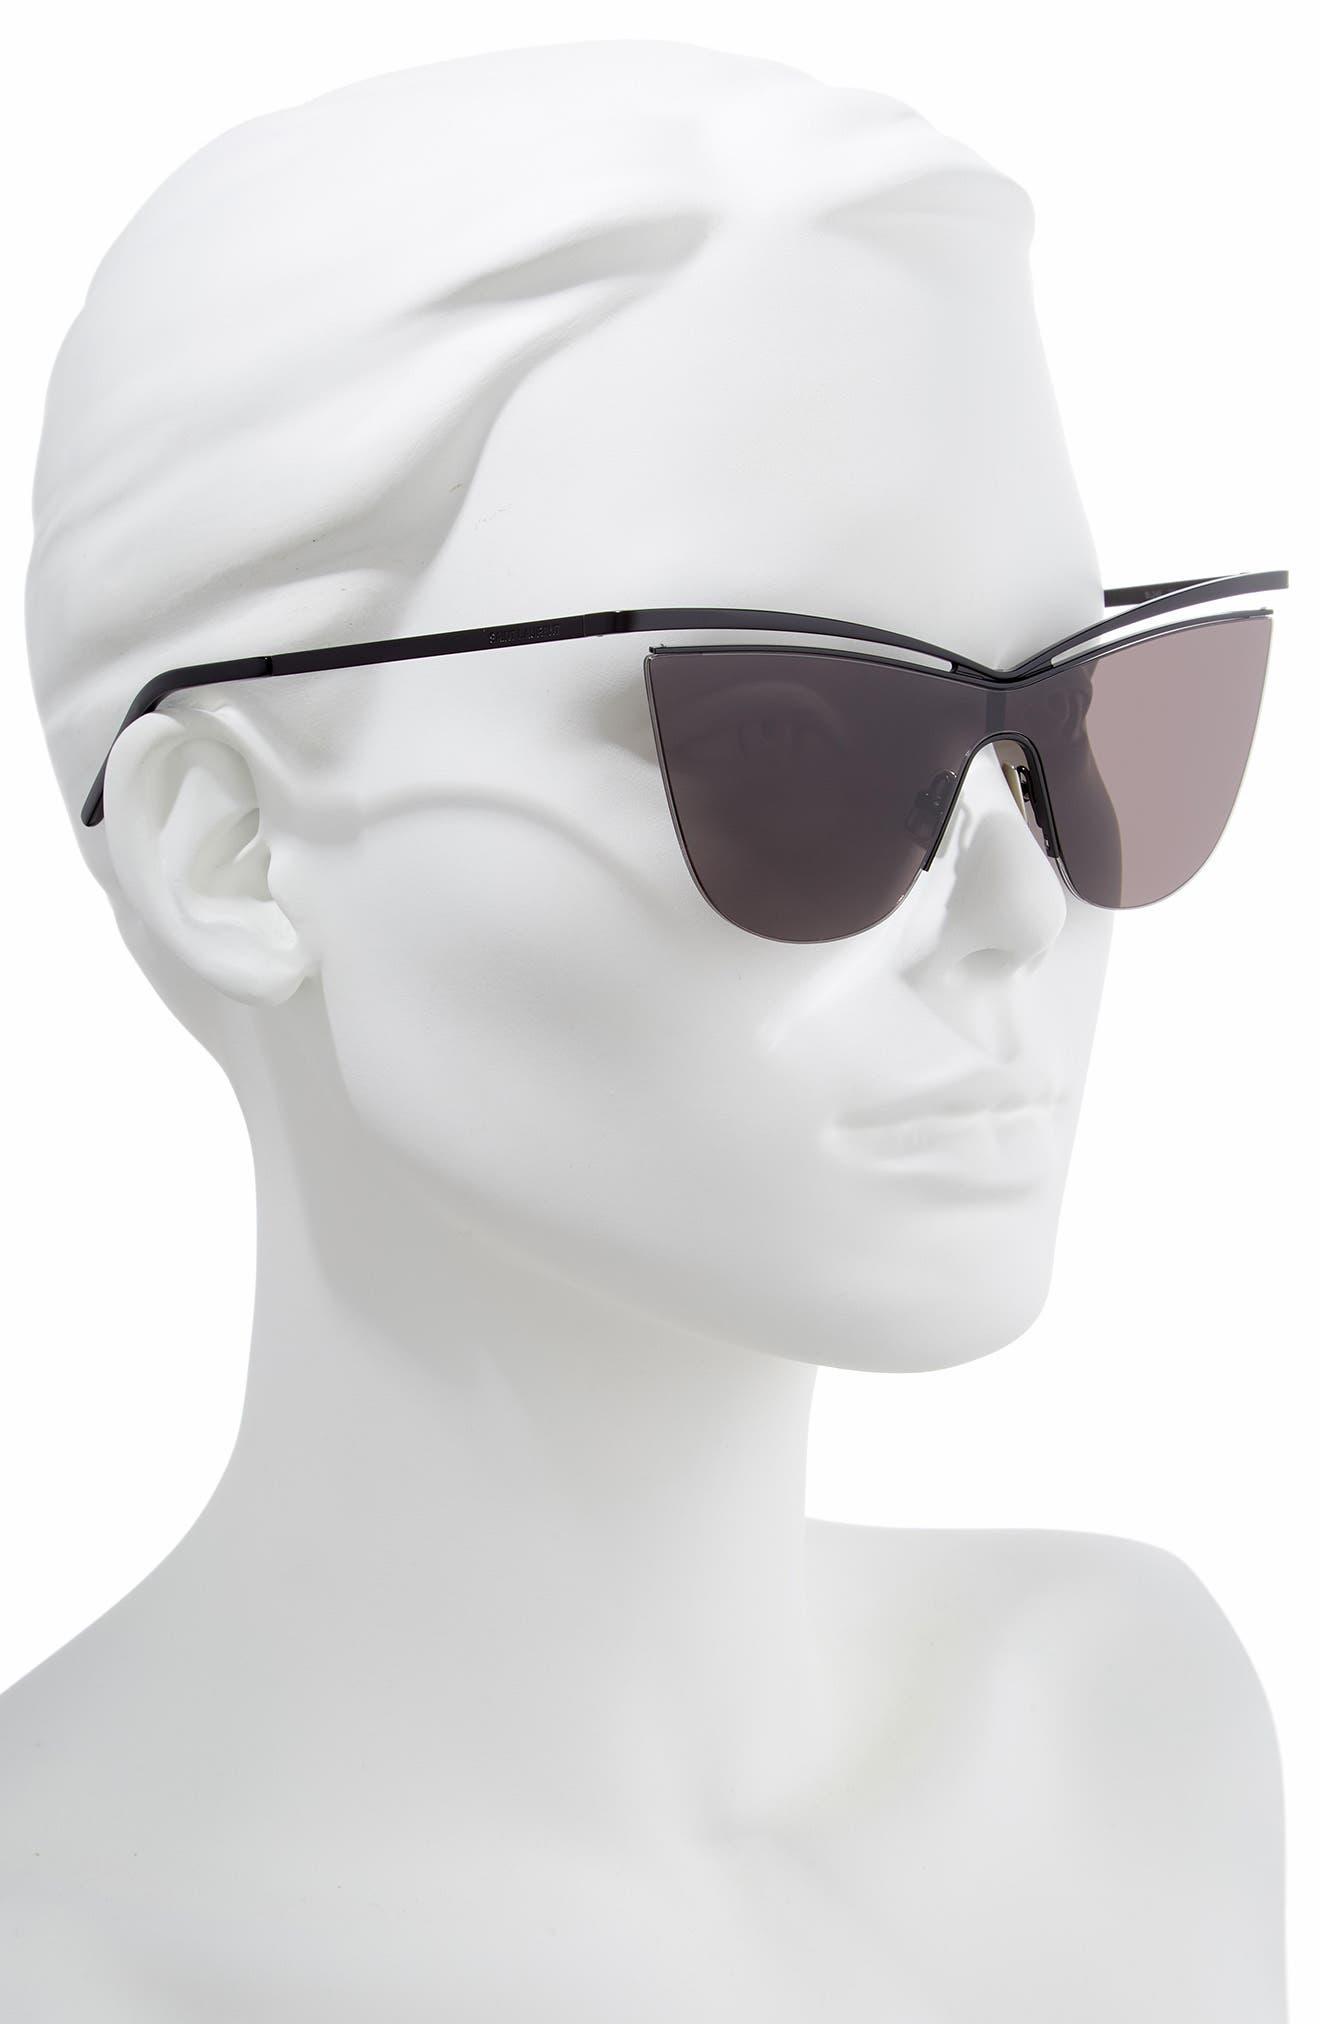 134mm Cat Eye Shield Sunglasses,                             Alternate thumbnail 2, color,                             BLACK/ BLACK